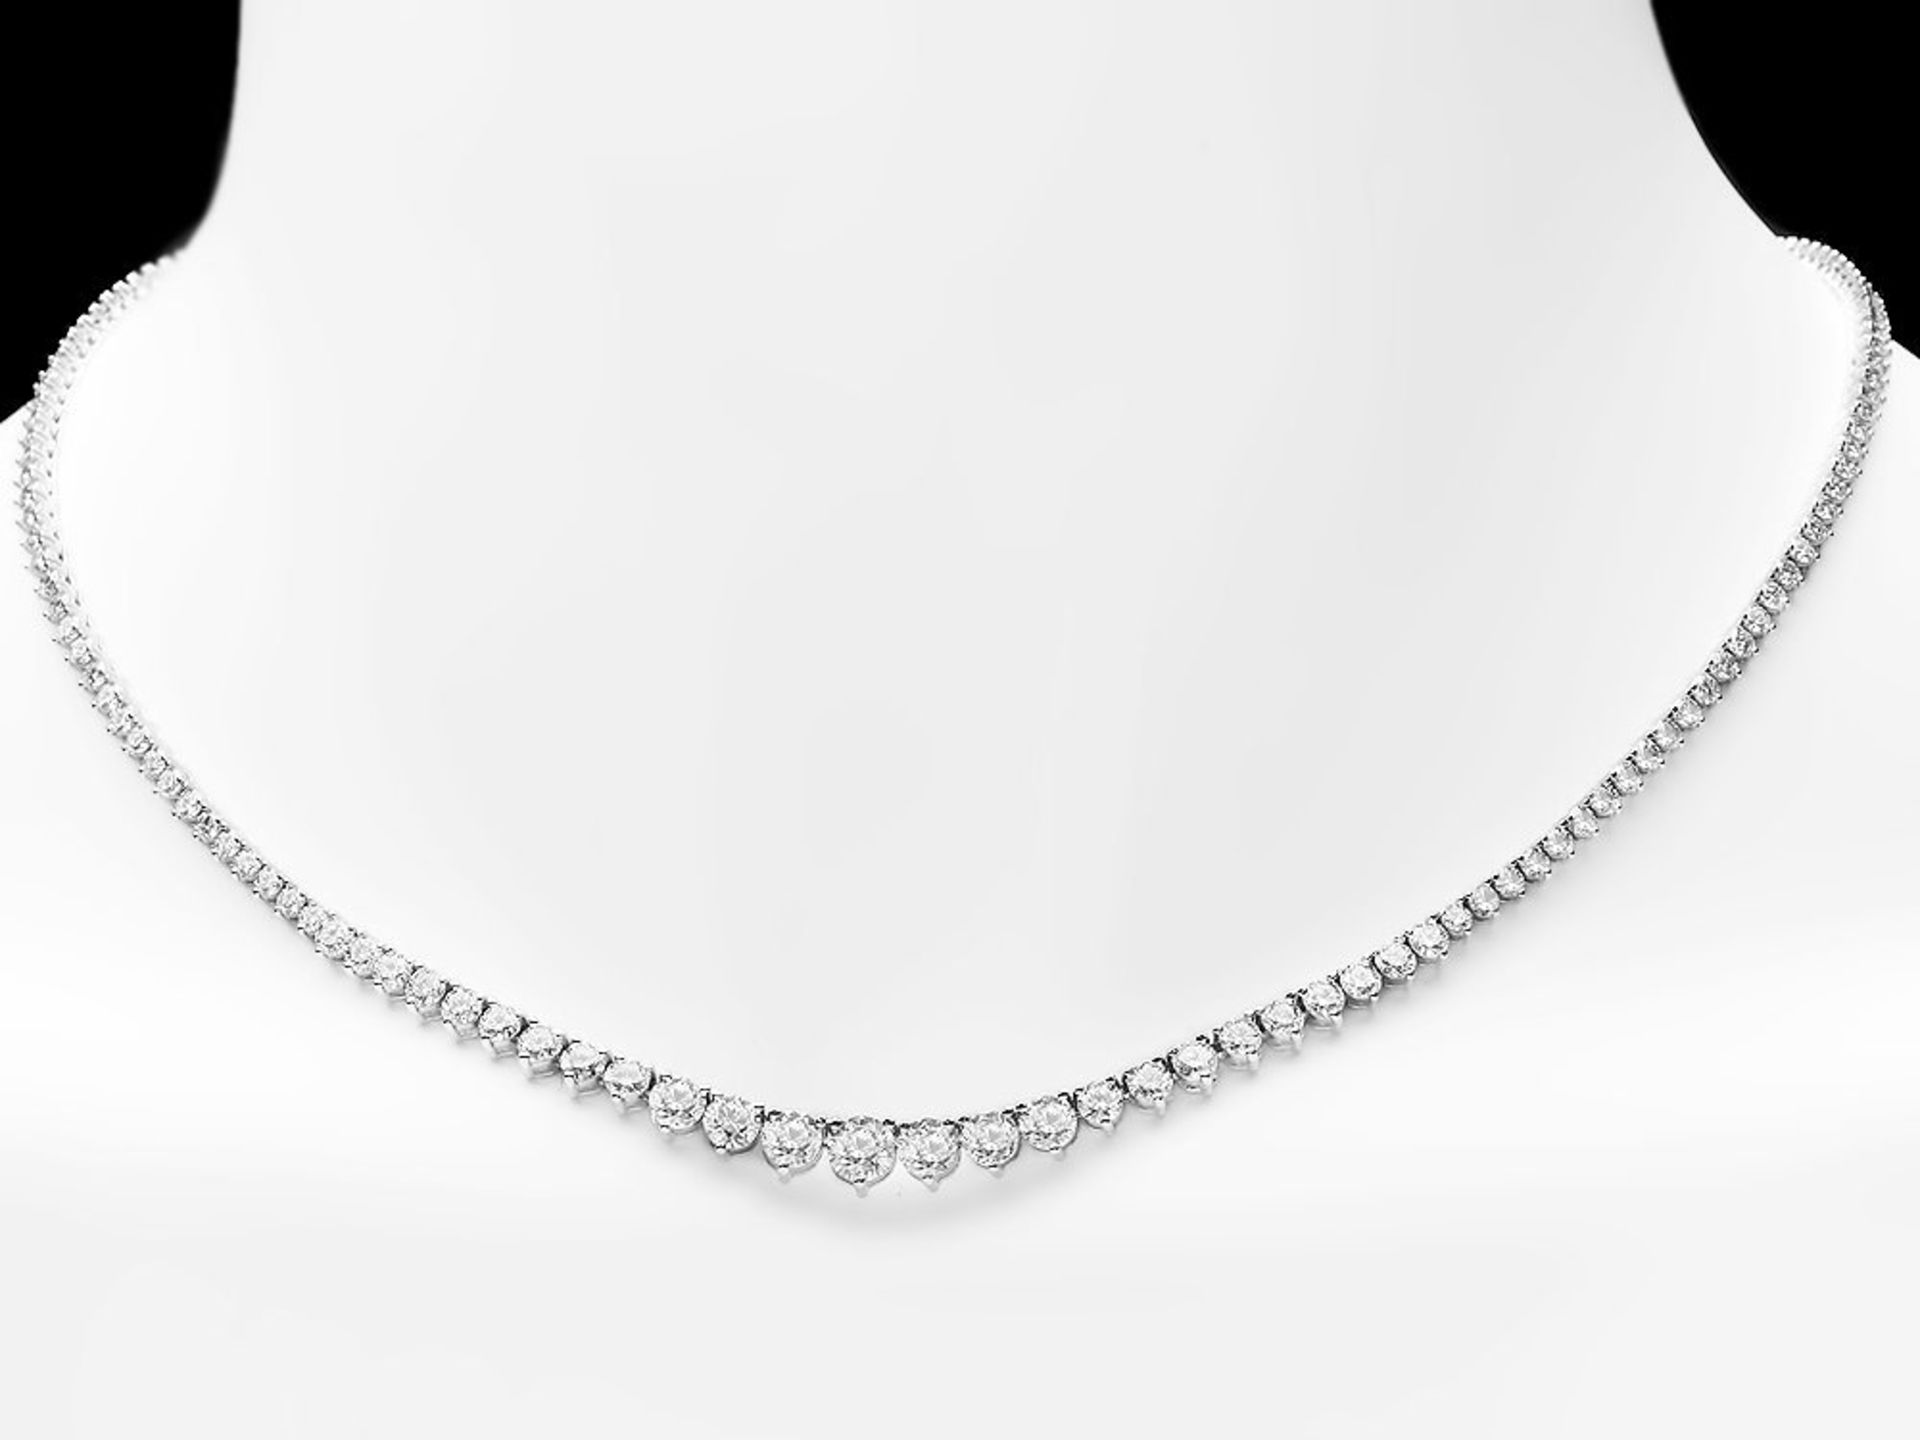 18k White Gold 9.00ct Diamond Necklace - Image 3 of 4